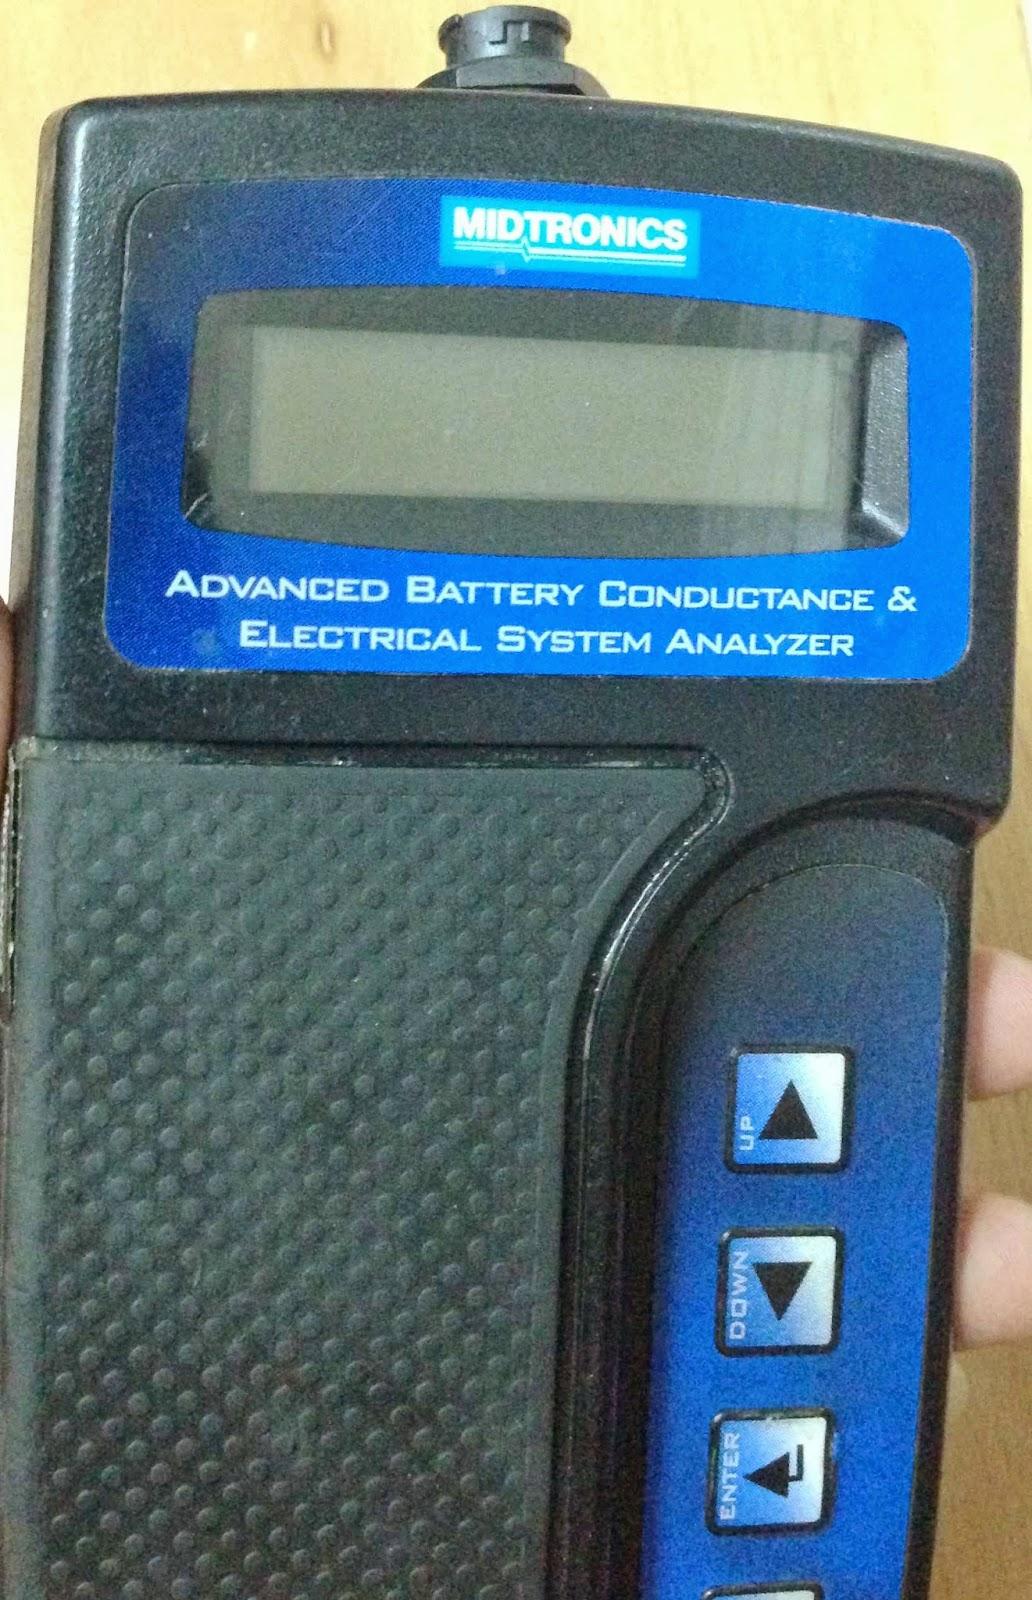 Midtronics micro 500 battery tester manualidades